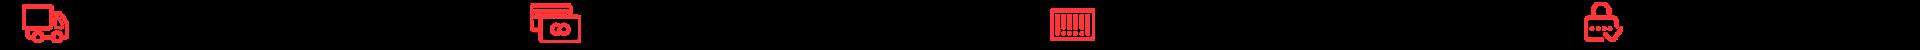 Banner Serviços da Loja